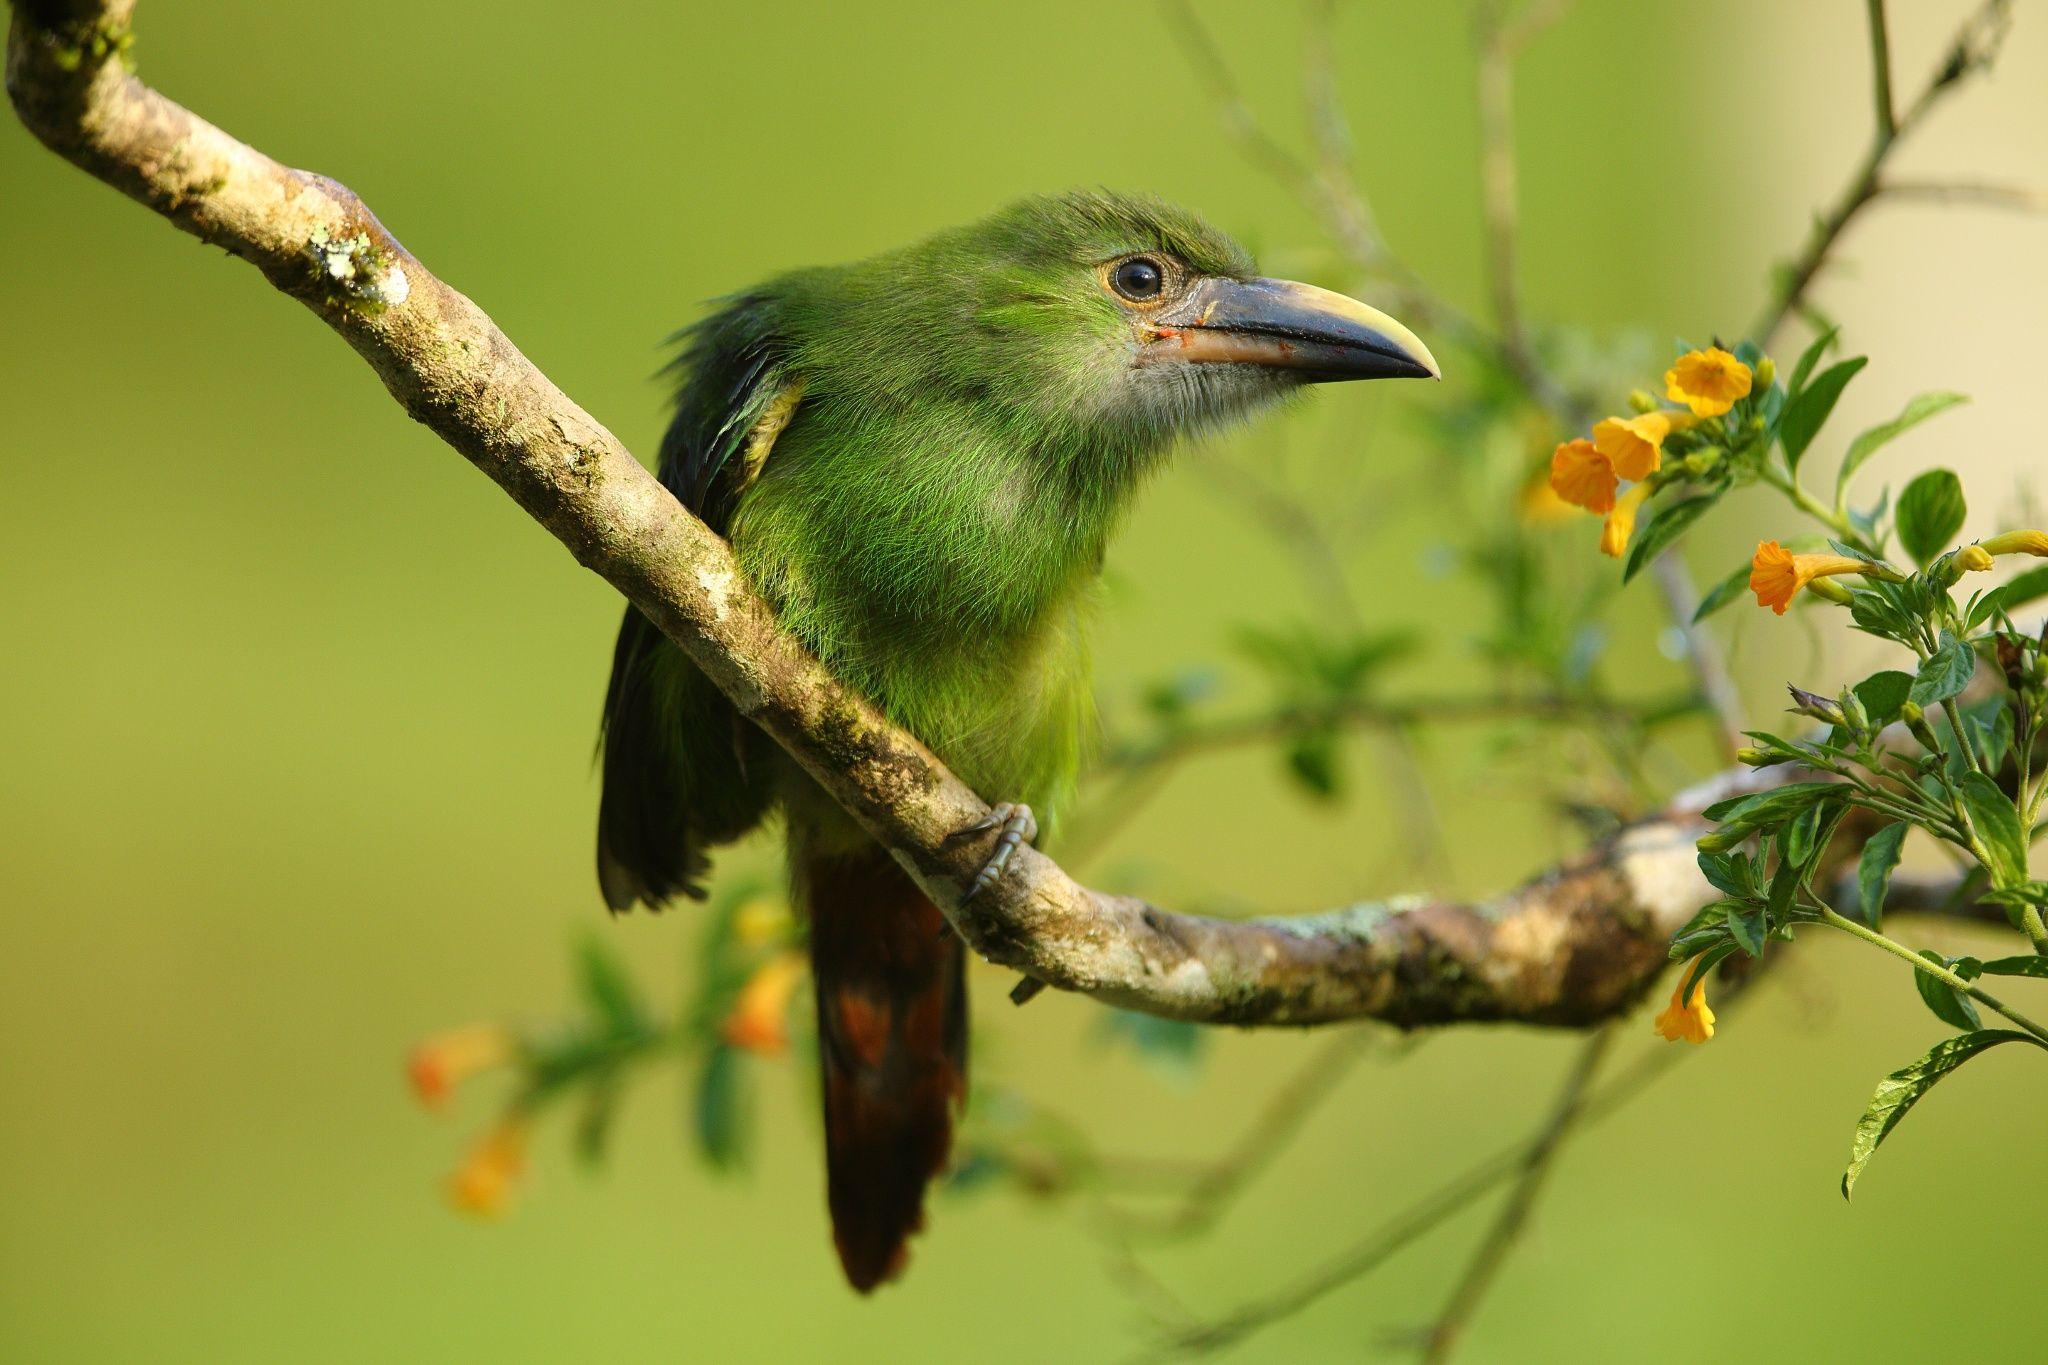 Emerald toucanet by Luz & Mario Restrepo on 500px